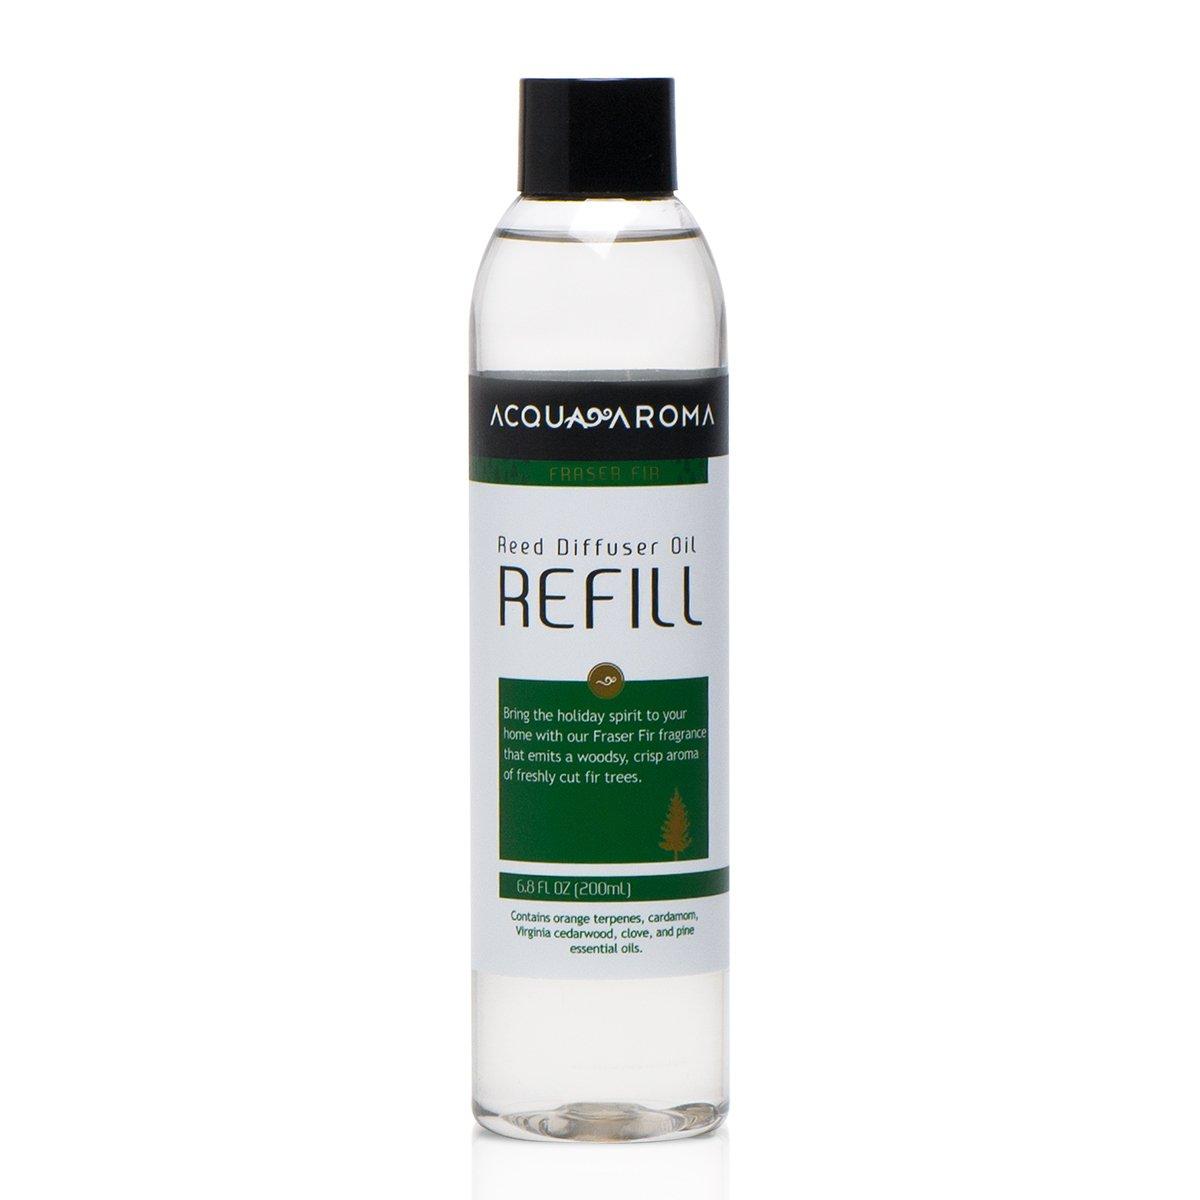 Acqua Aroma Fraser Fir Reed Diffuser Oil Refill 6.8 FL OZ (200ml) Contain essential oils. Frasier Fir Christmas Scent